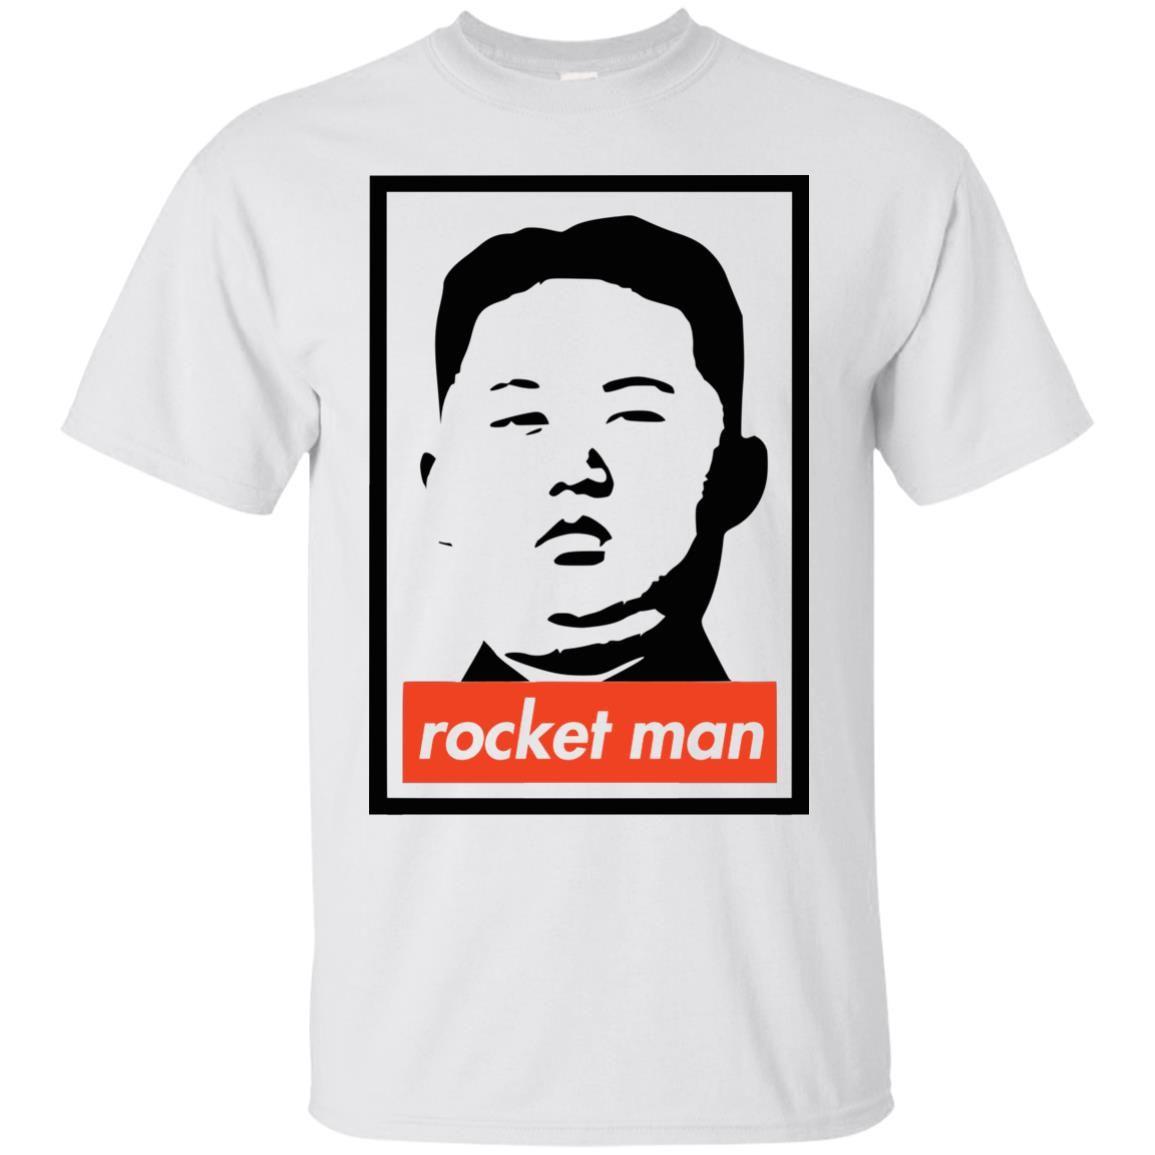 kim jong un rocket man shirt sweatshirt. Black Bedroom Furniture Sets. Home Design Ideas